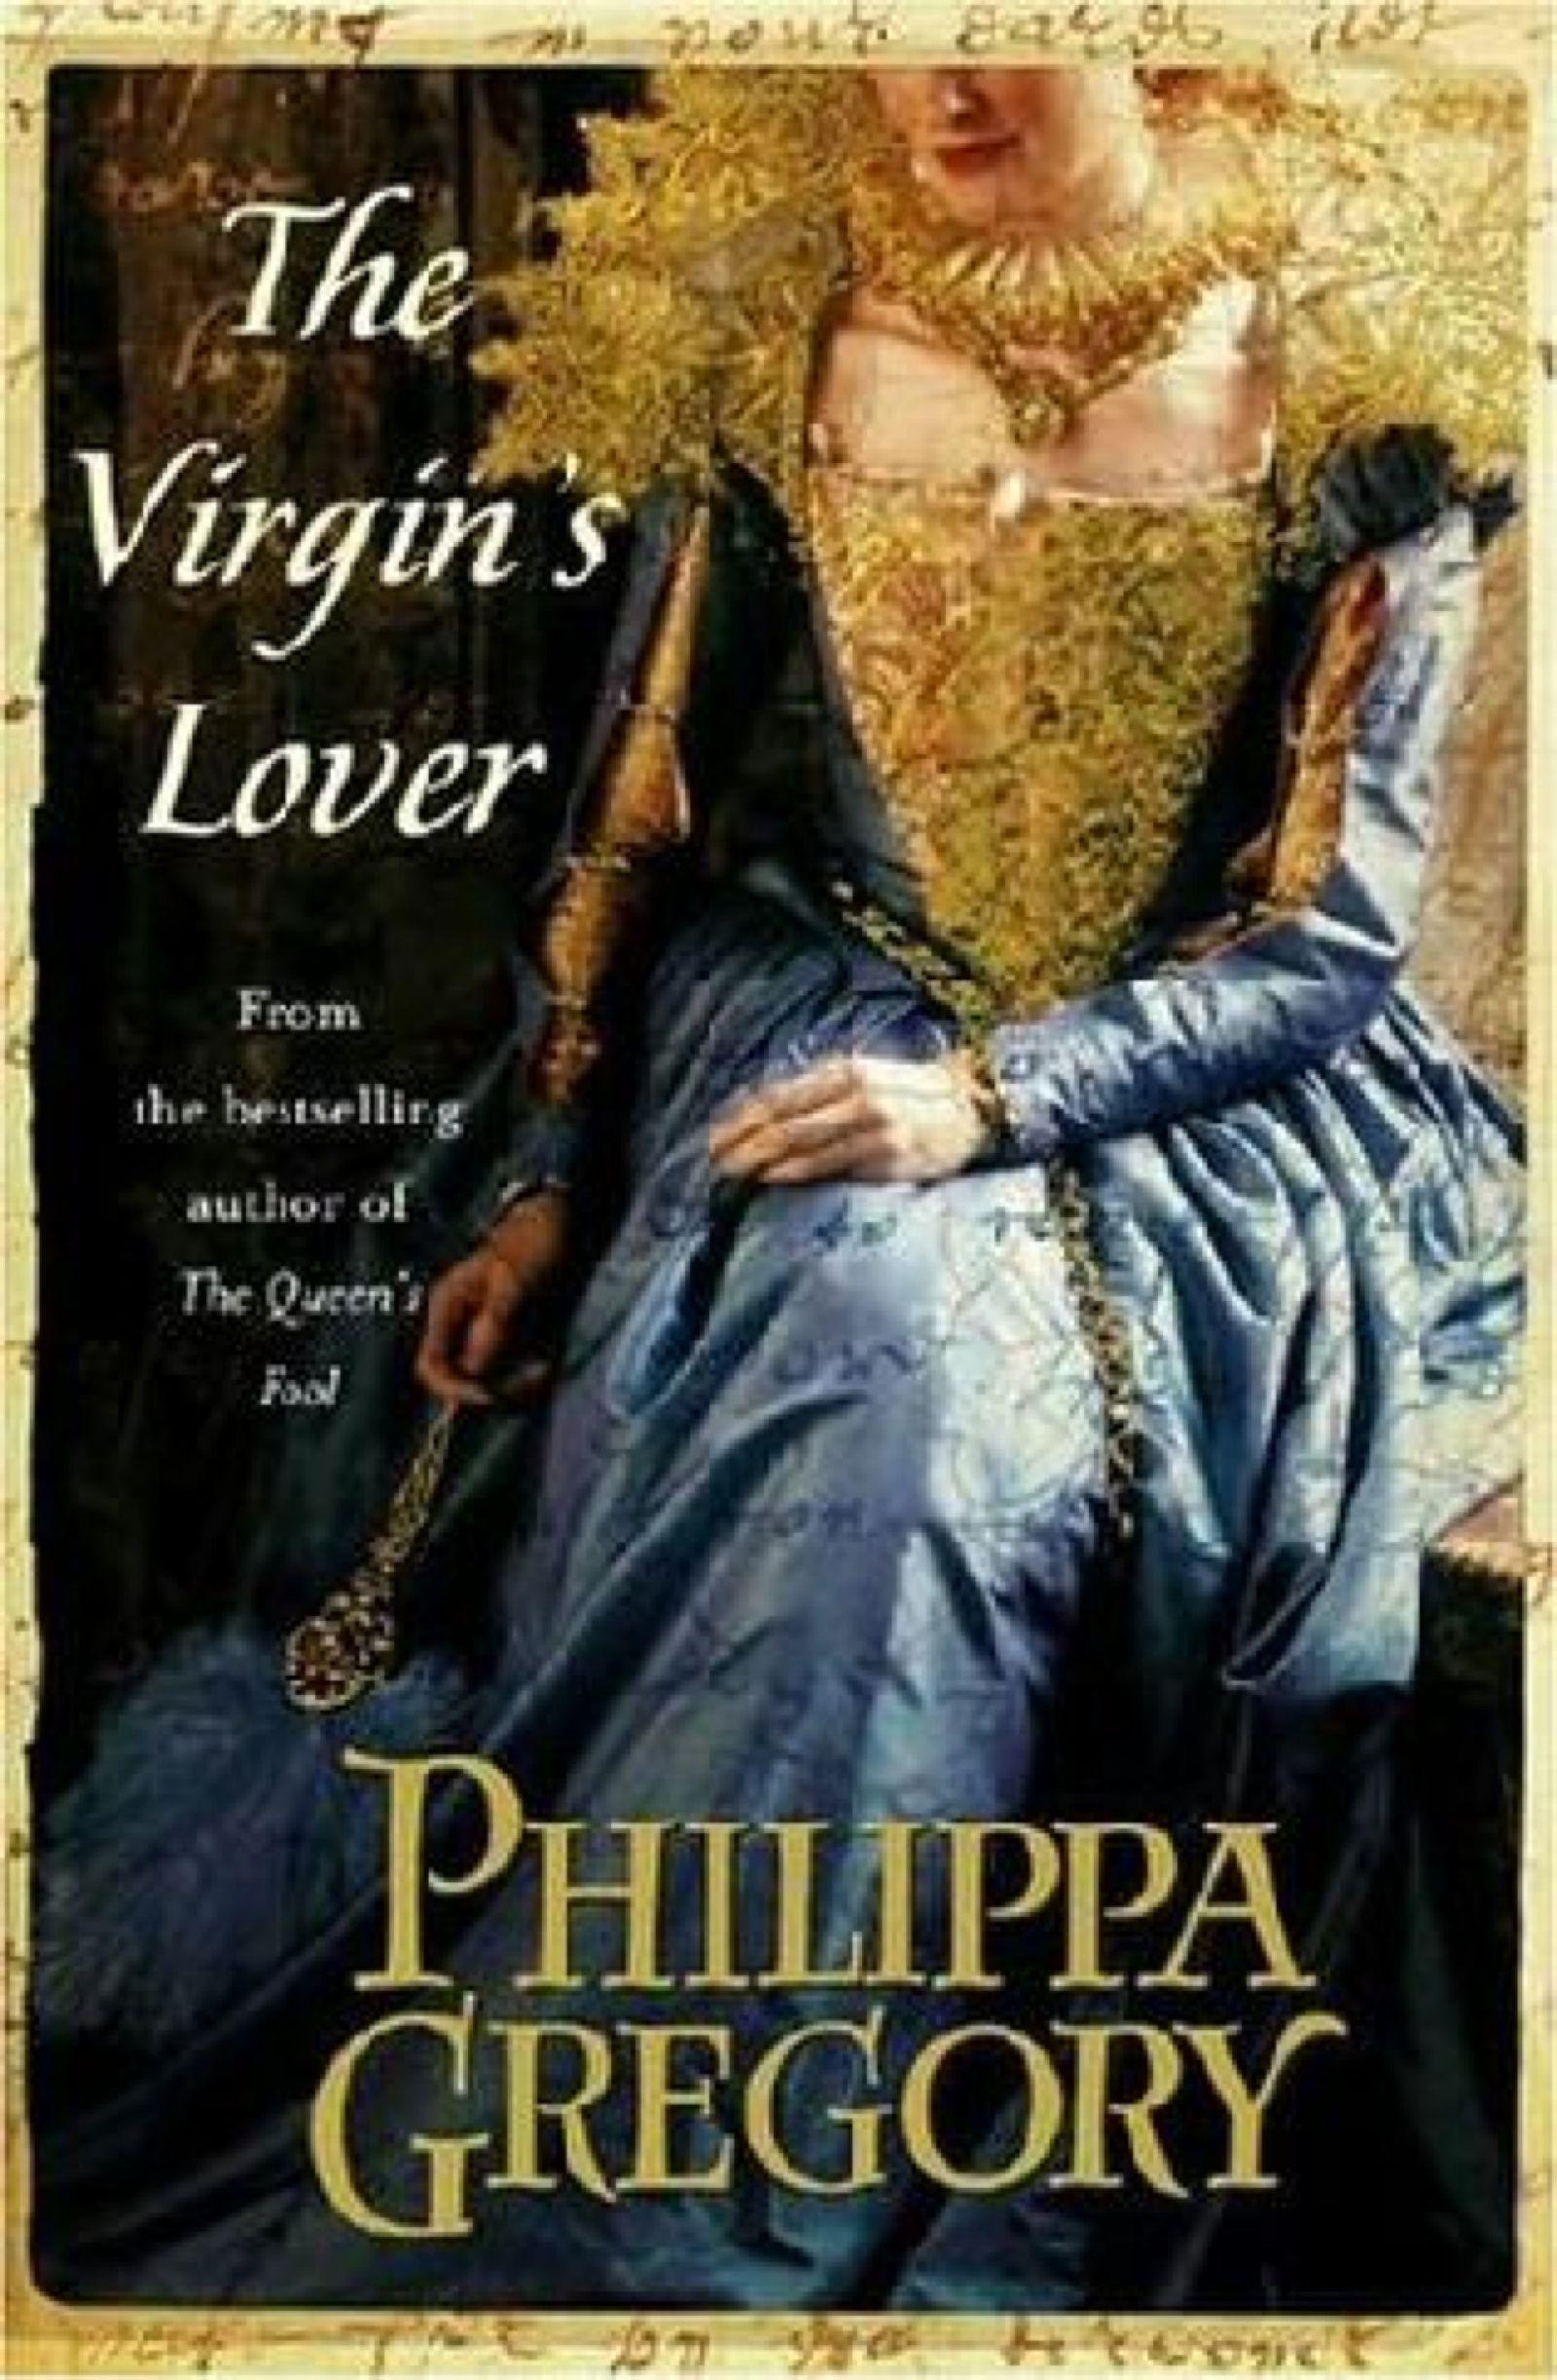 Philippa Gregory is wonderful!